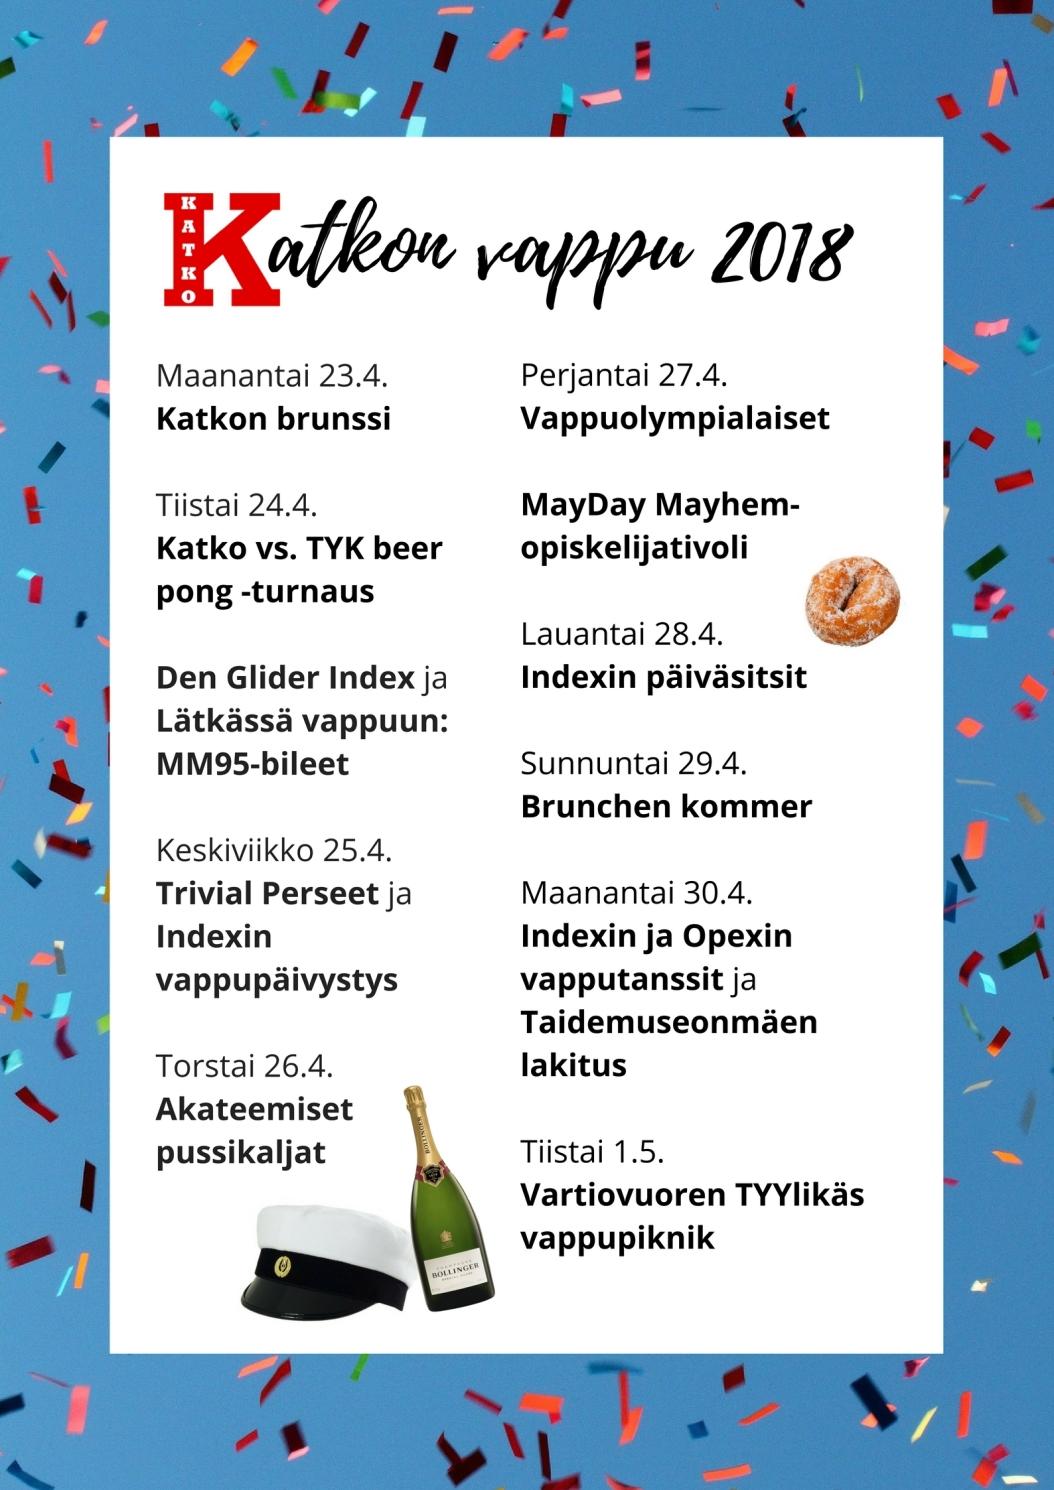 KatkonVappu 2018.jpg